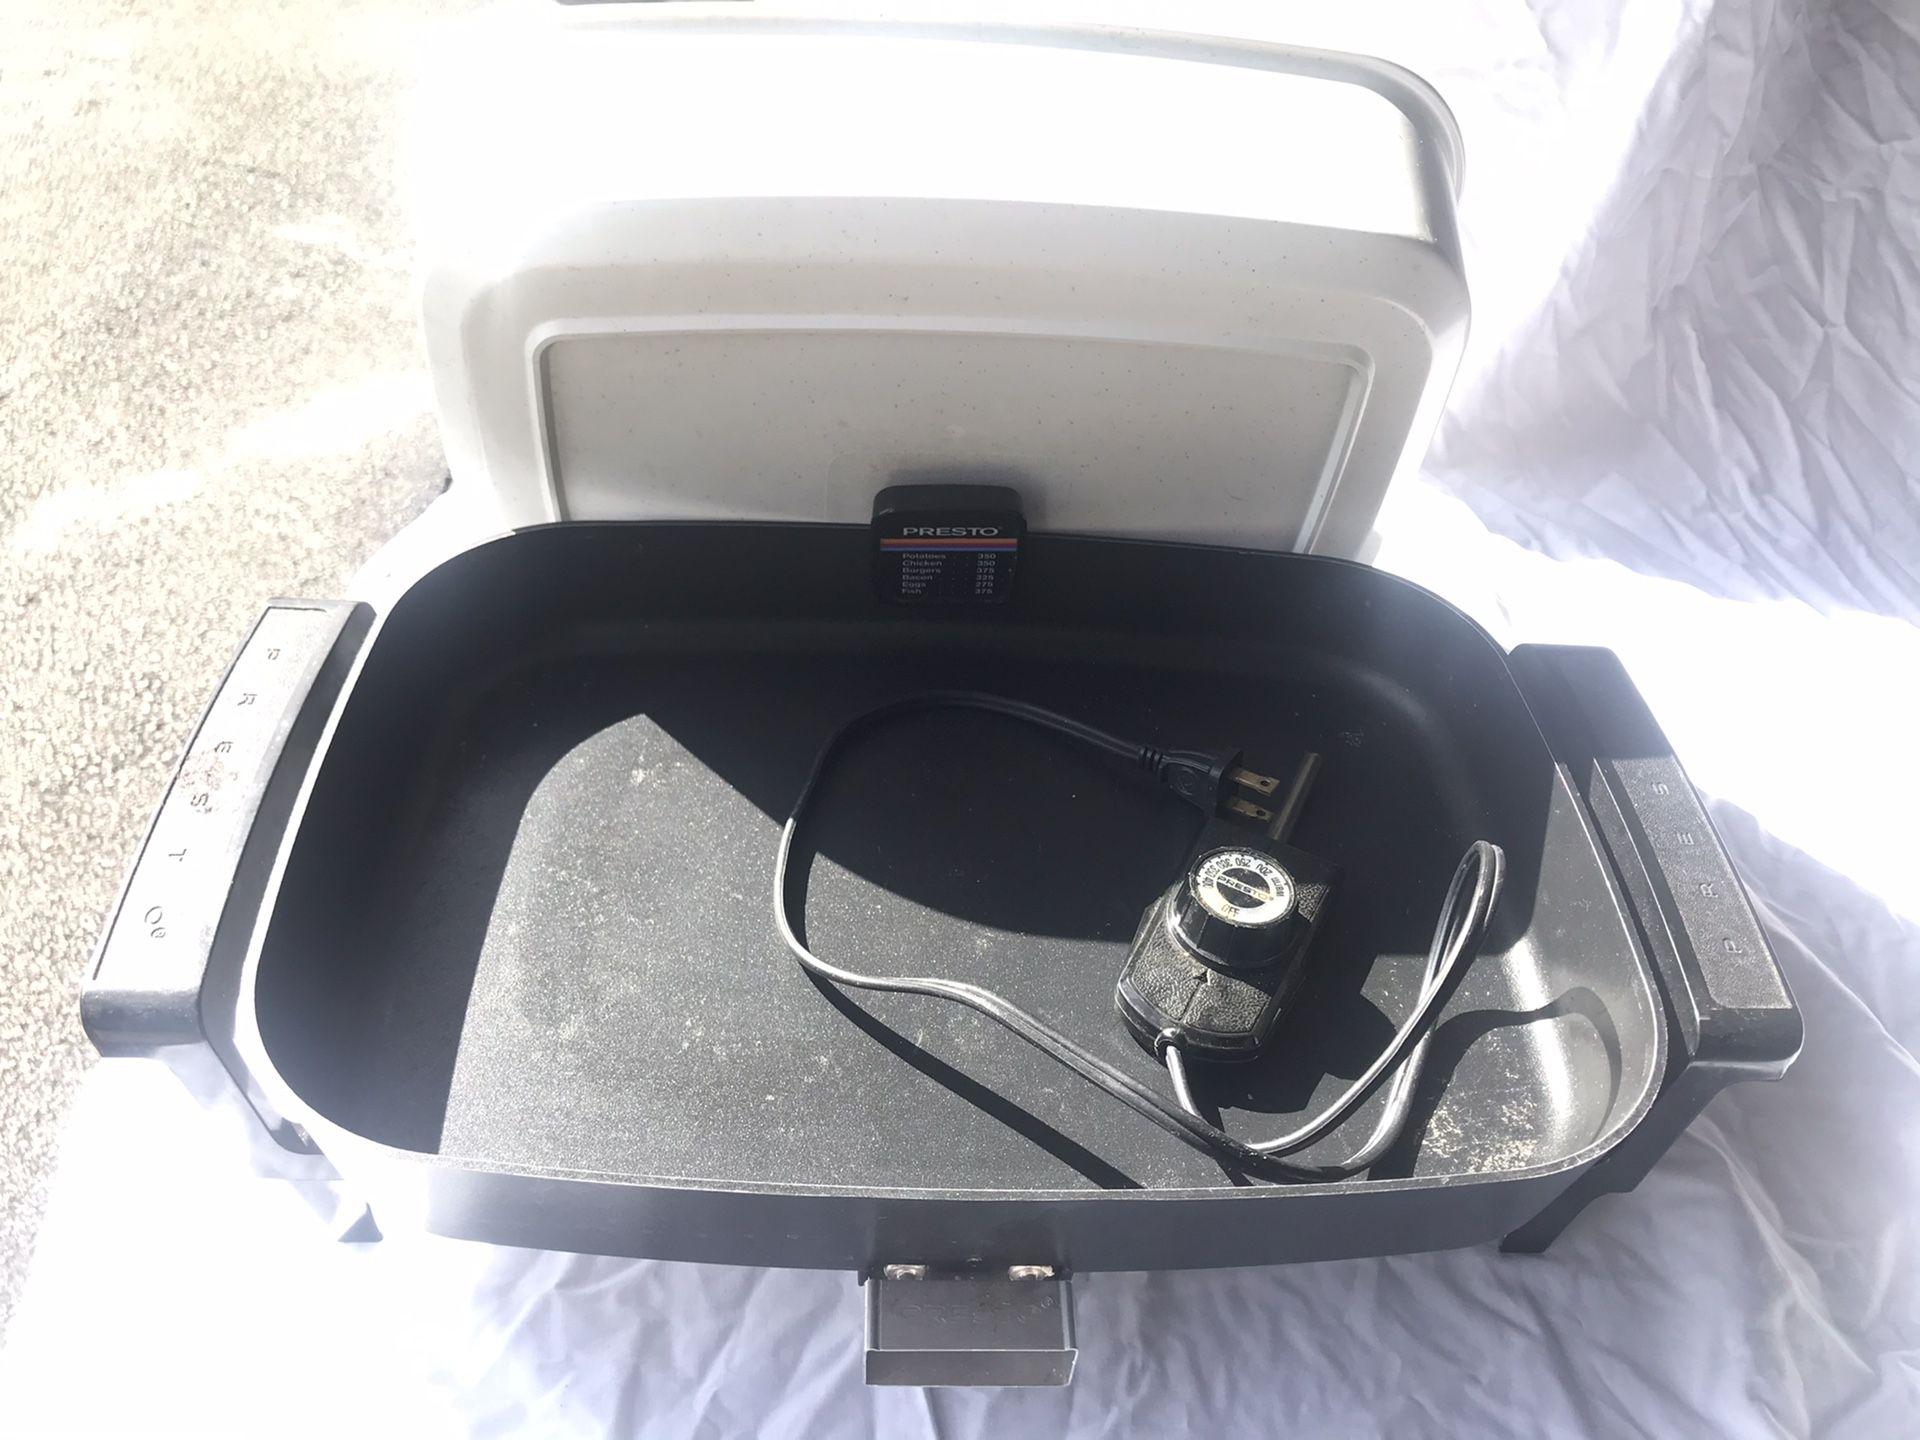 "Presto Countertop ELECTRIC SKILLET Frying Pan 15"" x 11"" Vintage 340G WORKS GREAT"